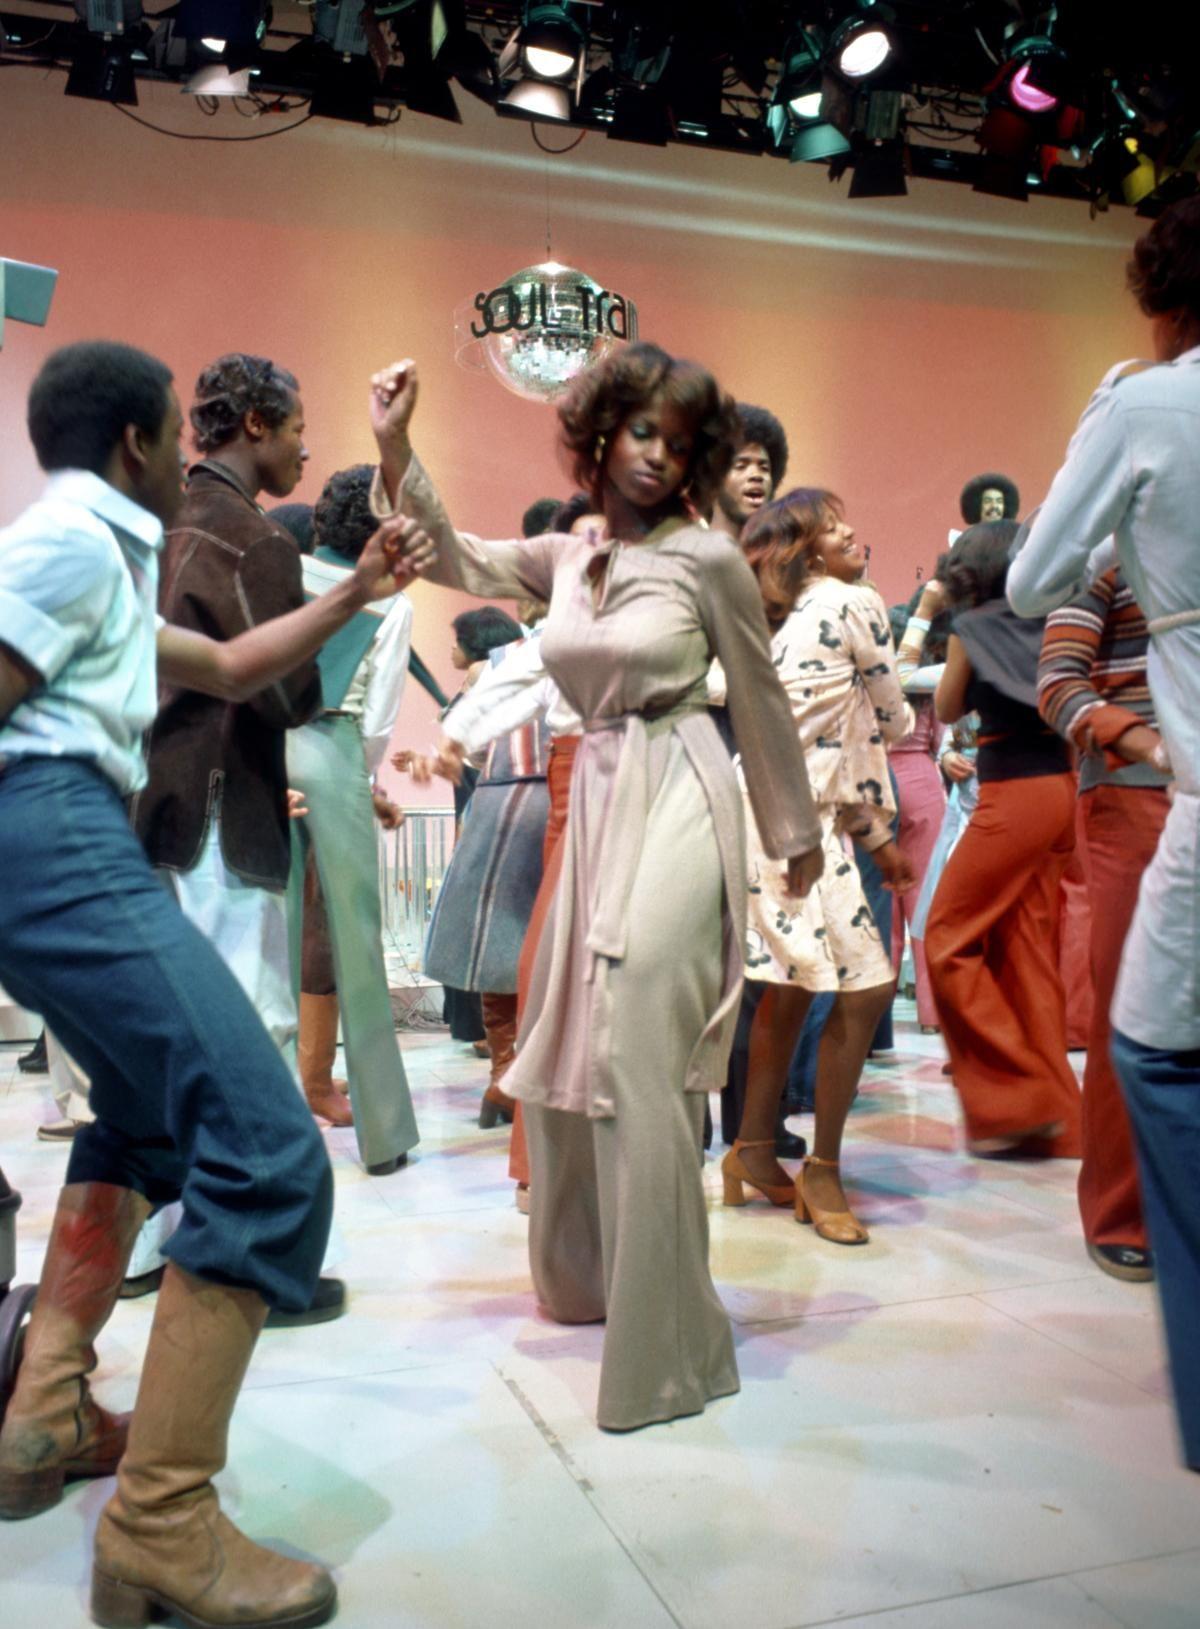 c387f2037e7c1 SOUL TRAIN DANCERS. SOUL TRAIN DANCERS Funk ...